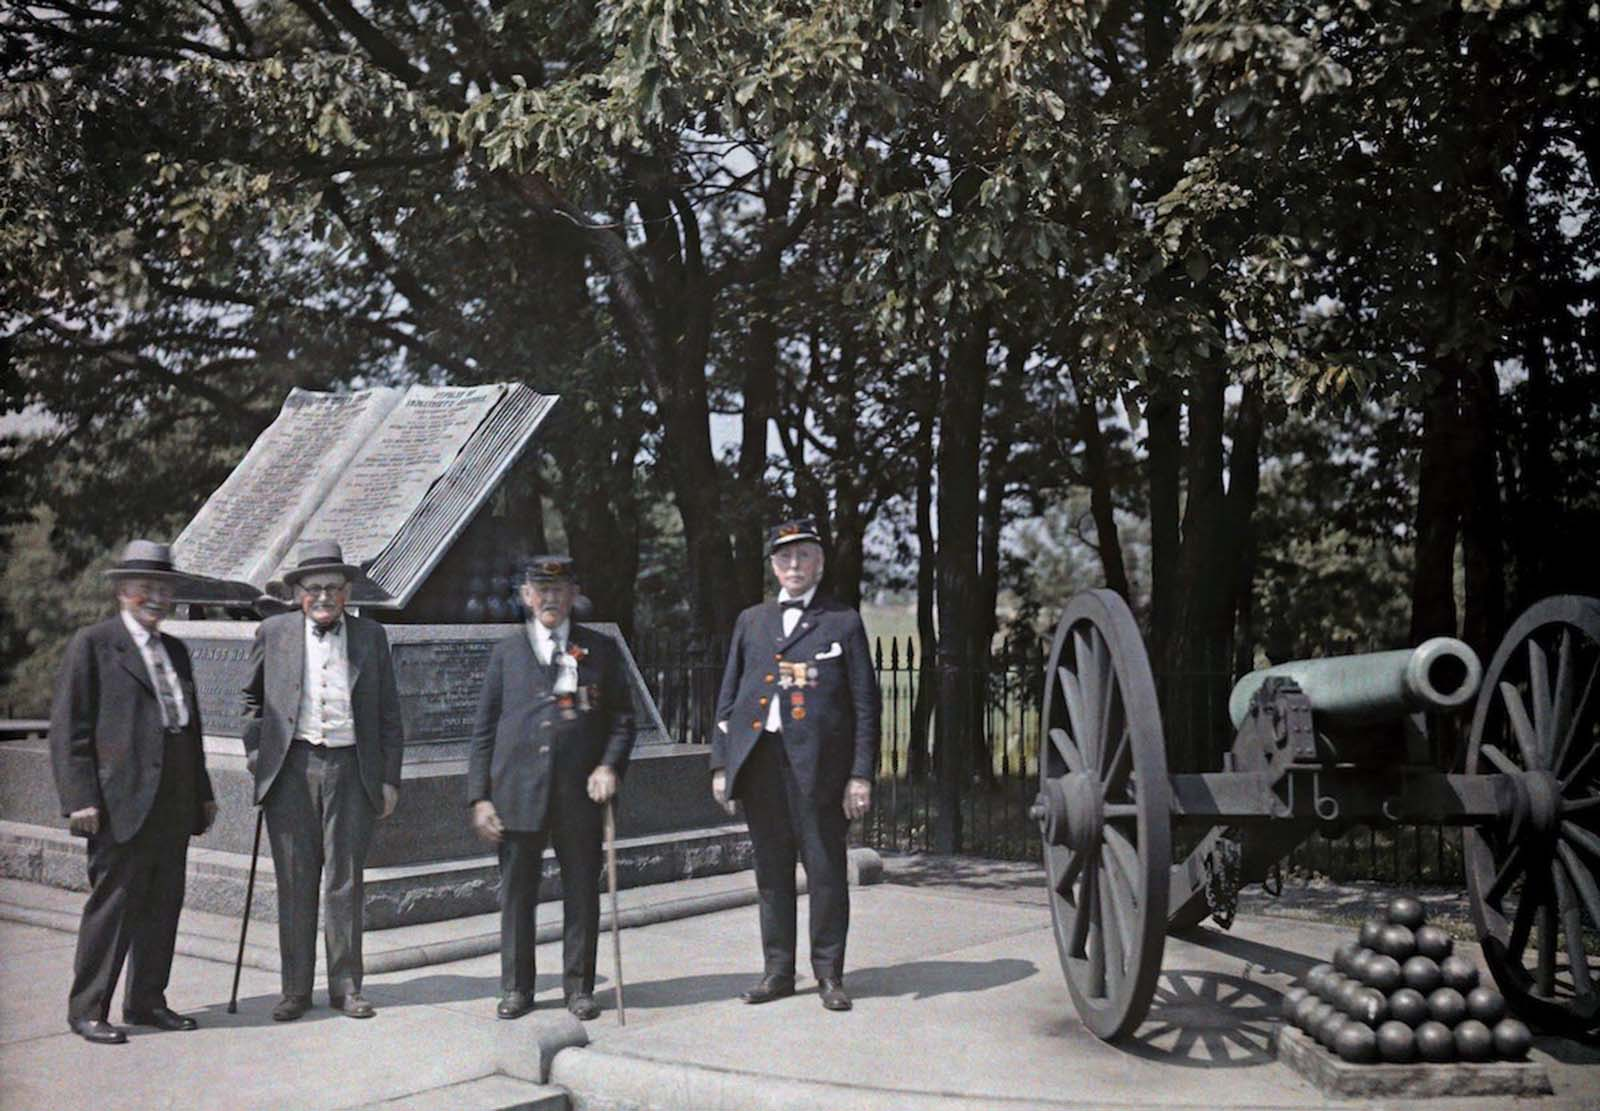 Gettysburg National Military Park, Gettysburg, Pennsylvania — Union Civil War veterans stand in front a monument at Gettysburg. 1931.